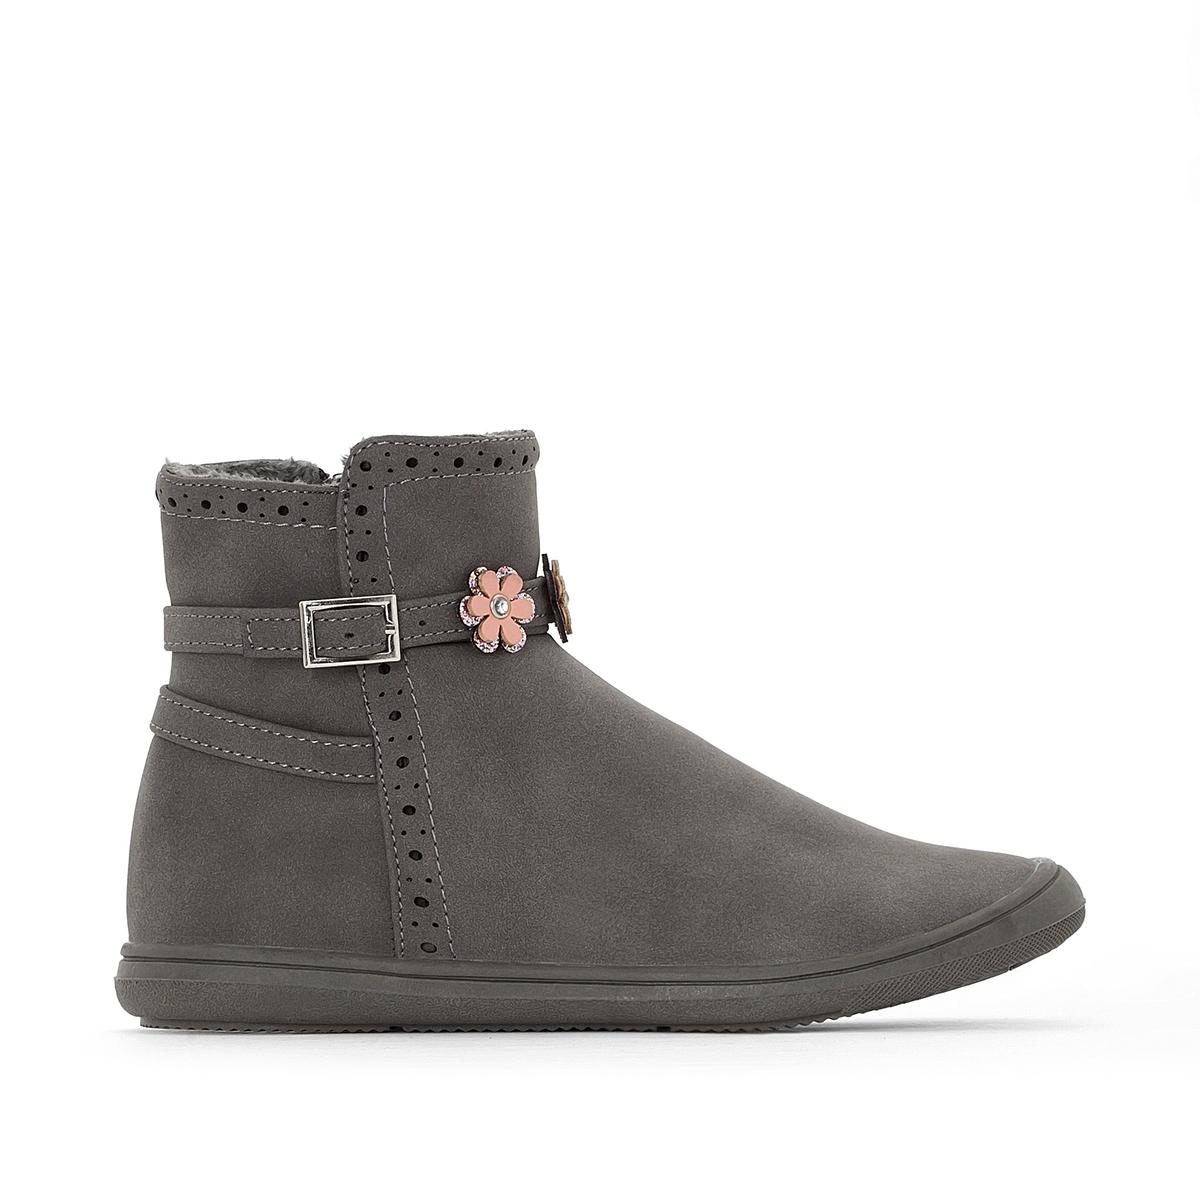 Ботинки с цветами 26-35